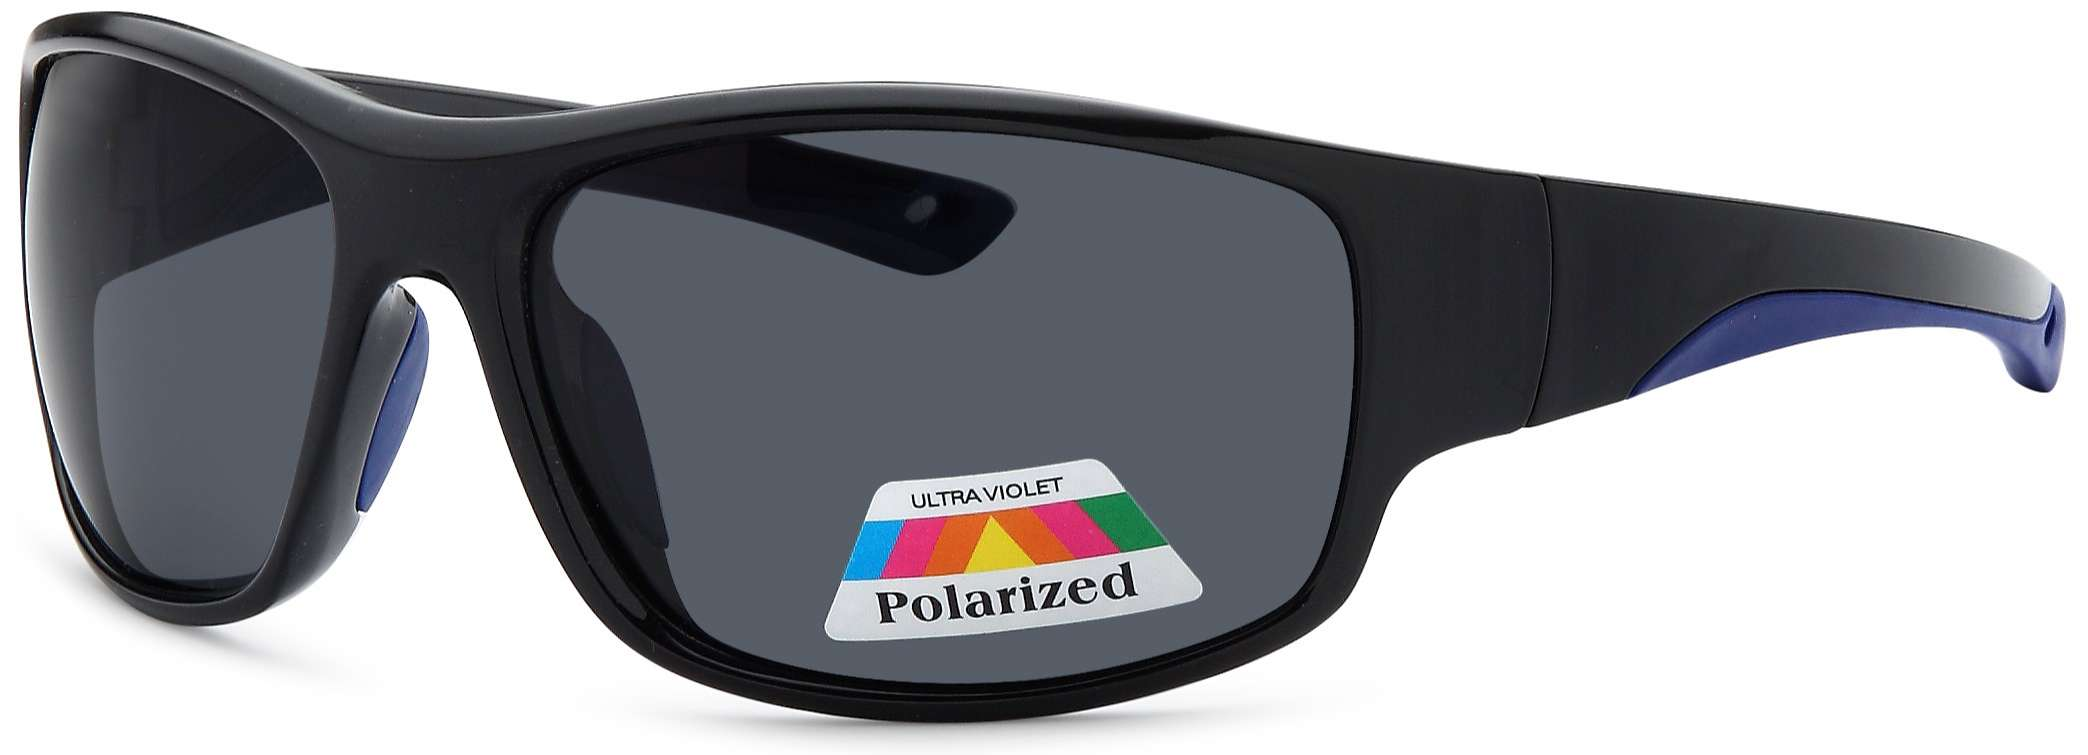 Black frame polarized sunglasses